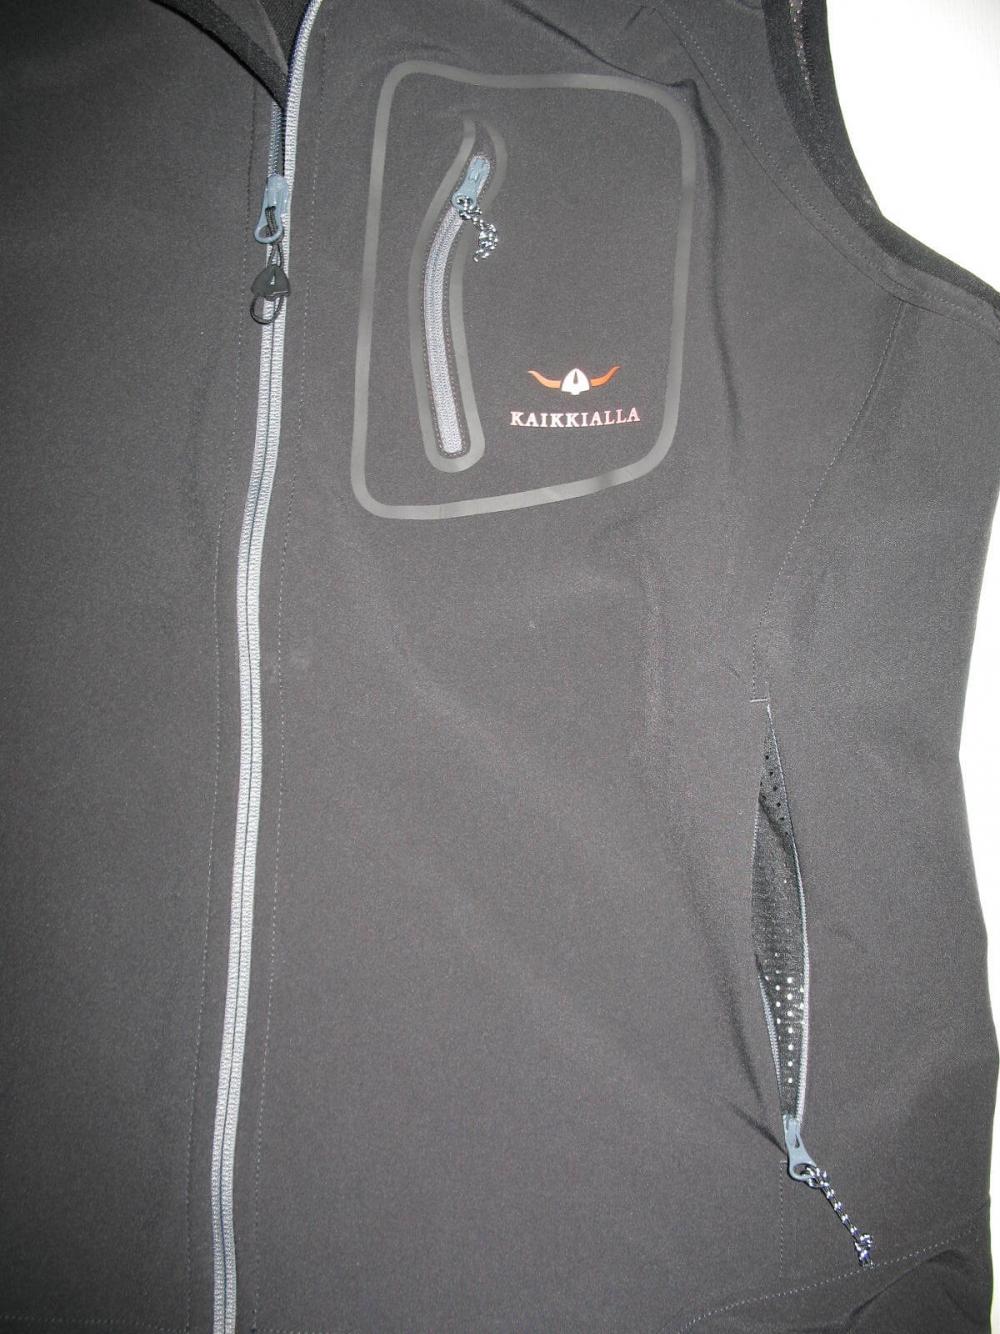 Жилет KAIKKIALLA softshell vest (размер L) - 4